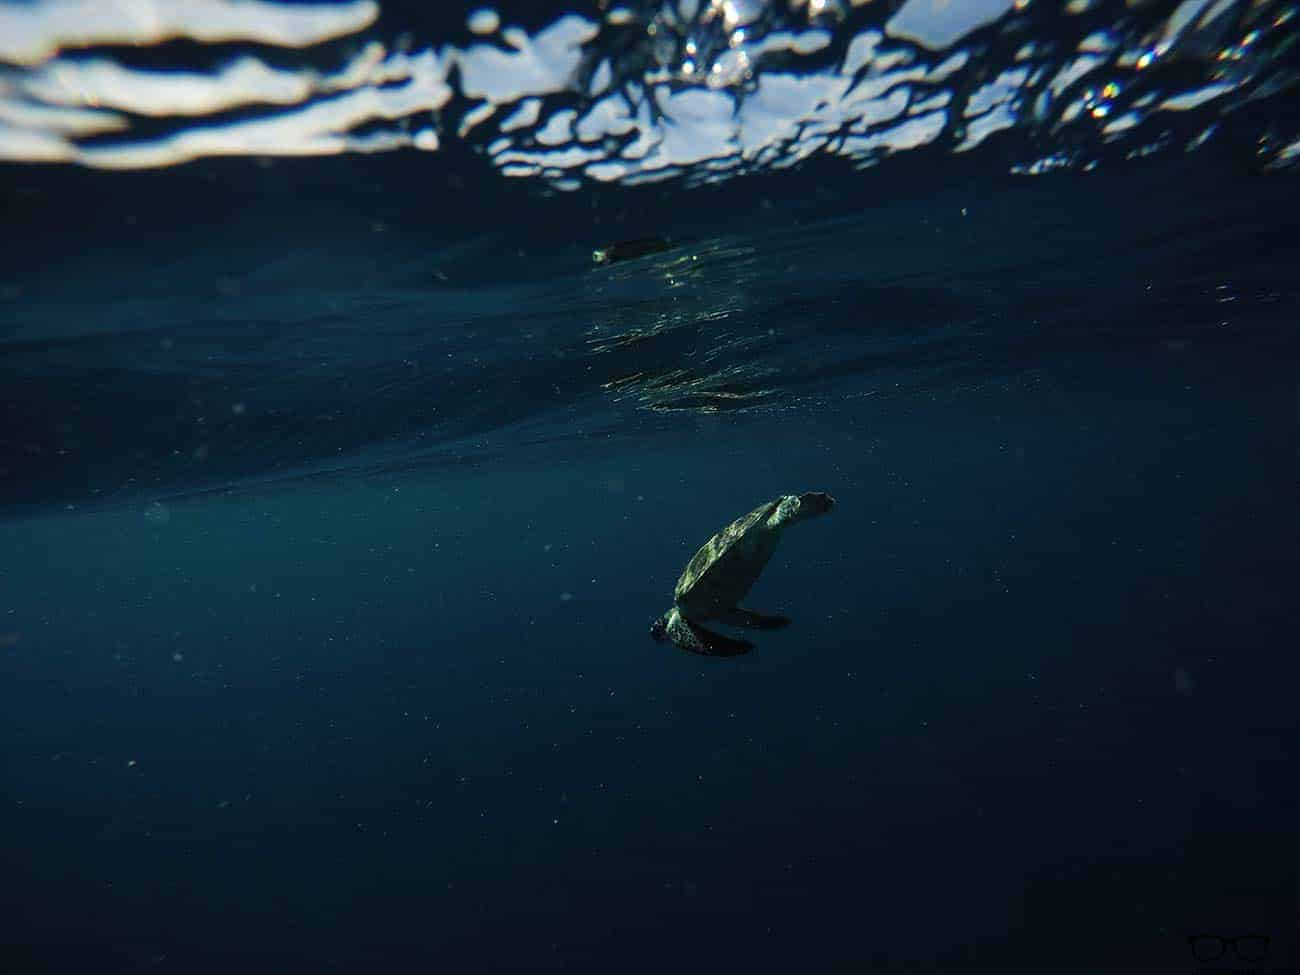 Beauty of the Ocean - a turtle enjoying its waters